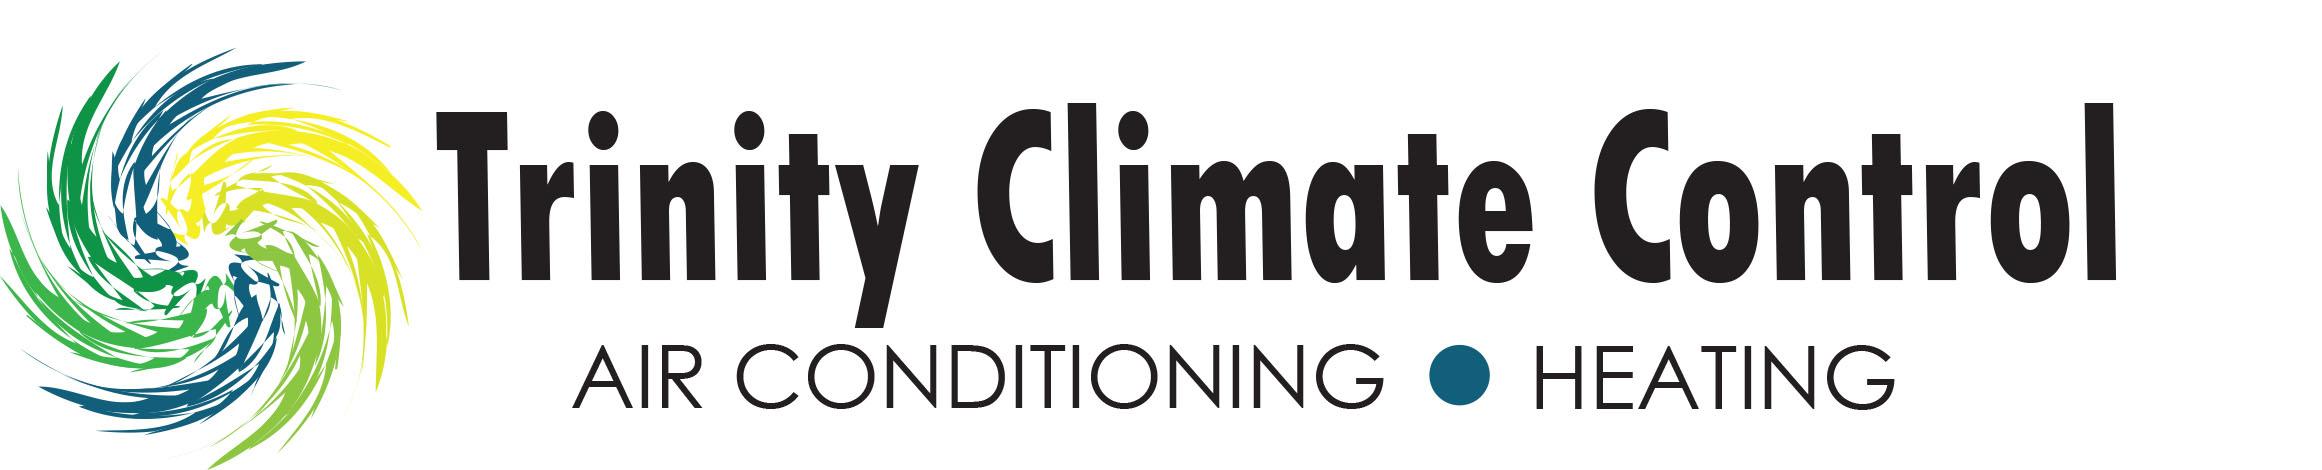 Trinity Climate Control logo.jpg